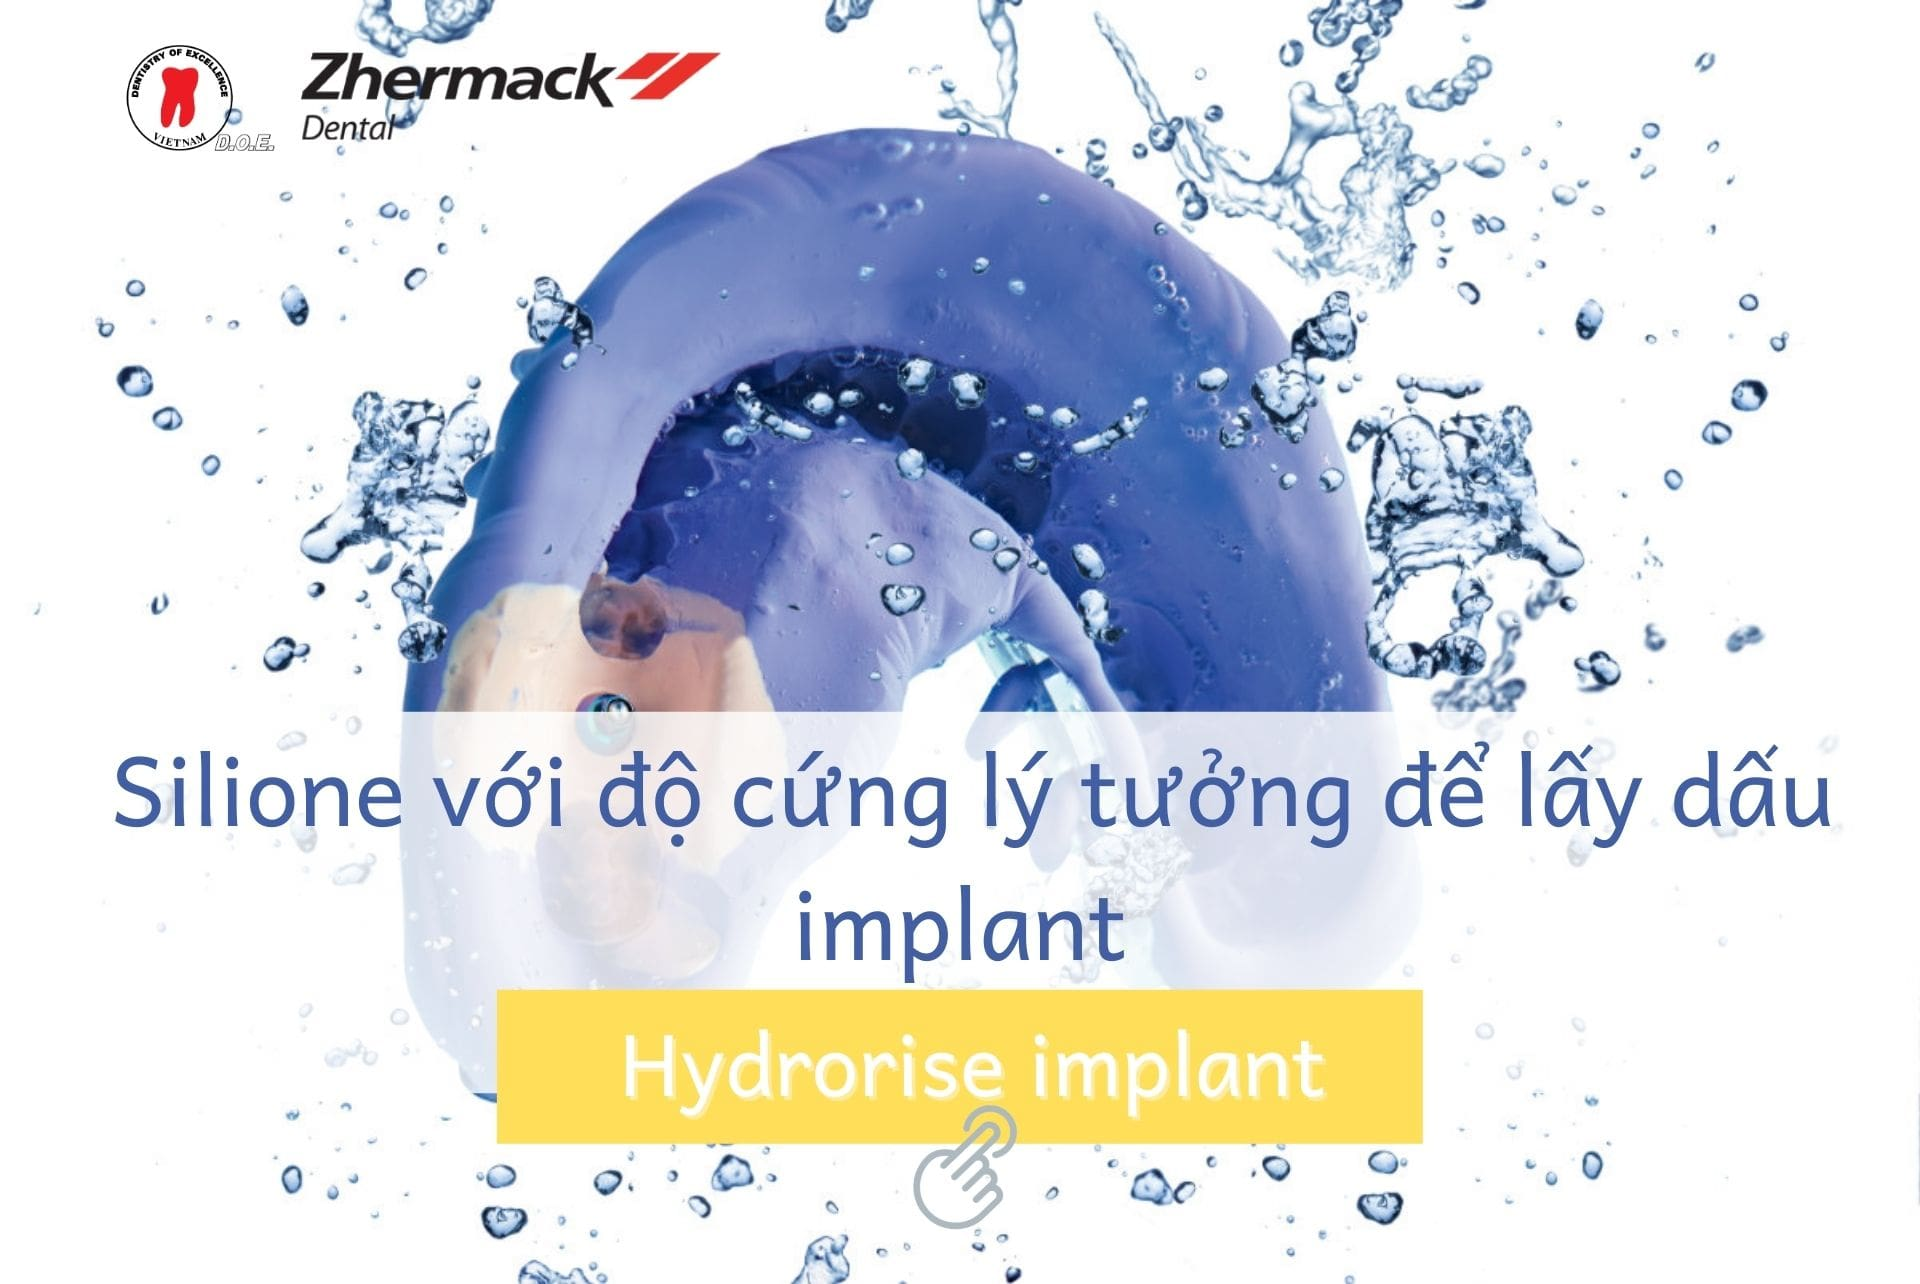 hydrorise-implant-lay-dau-implant